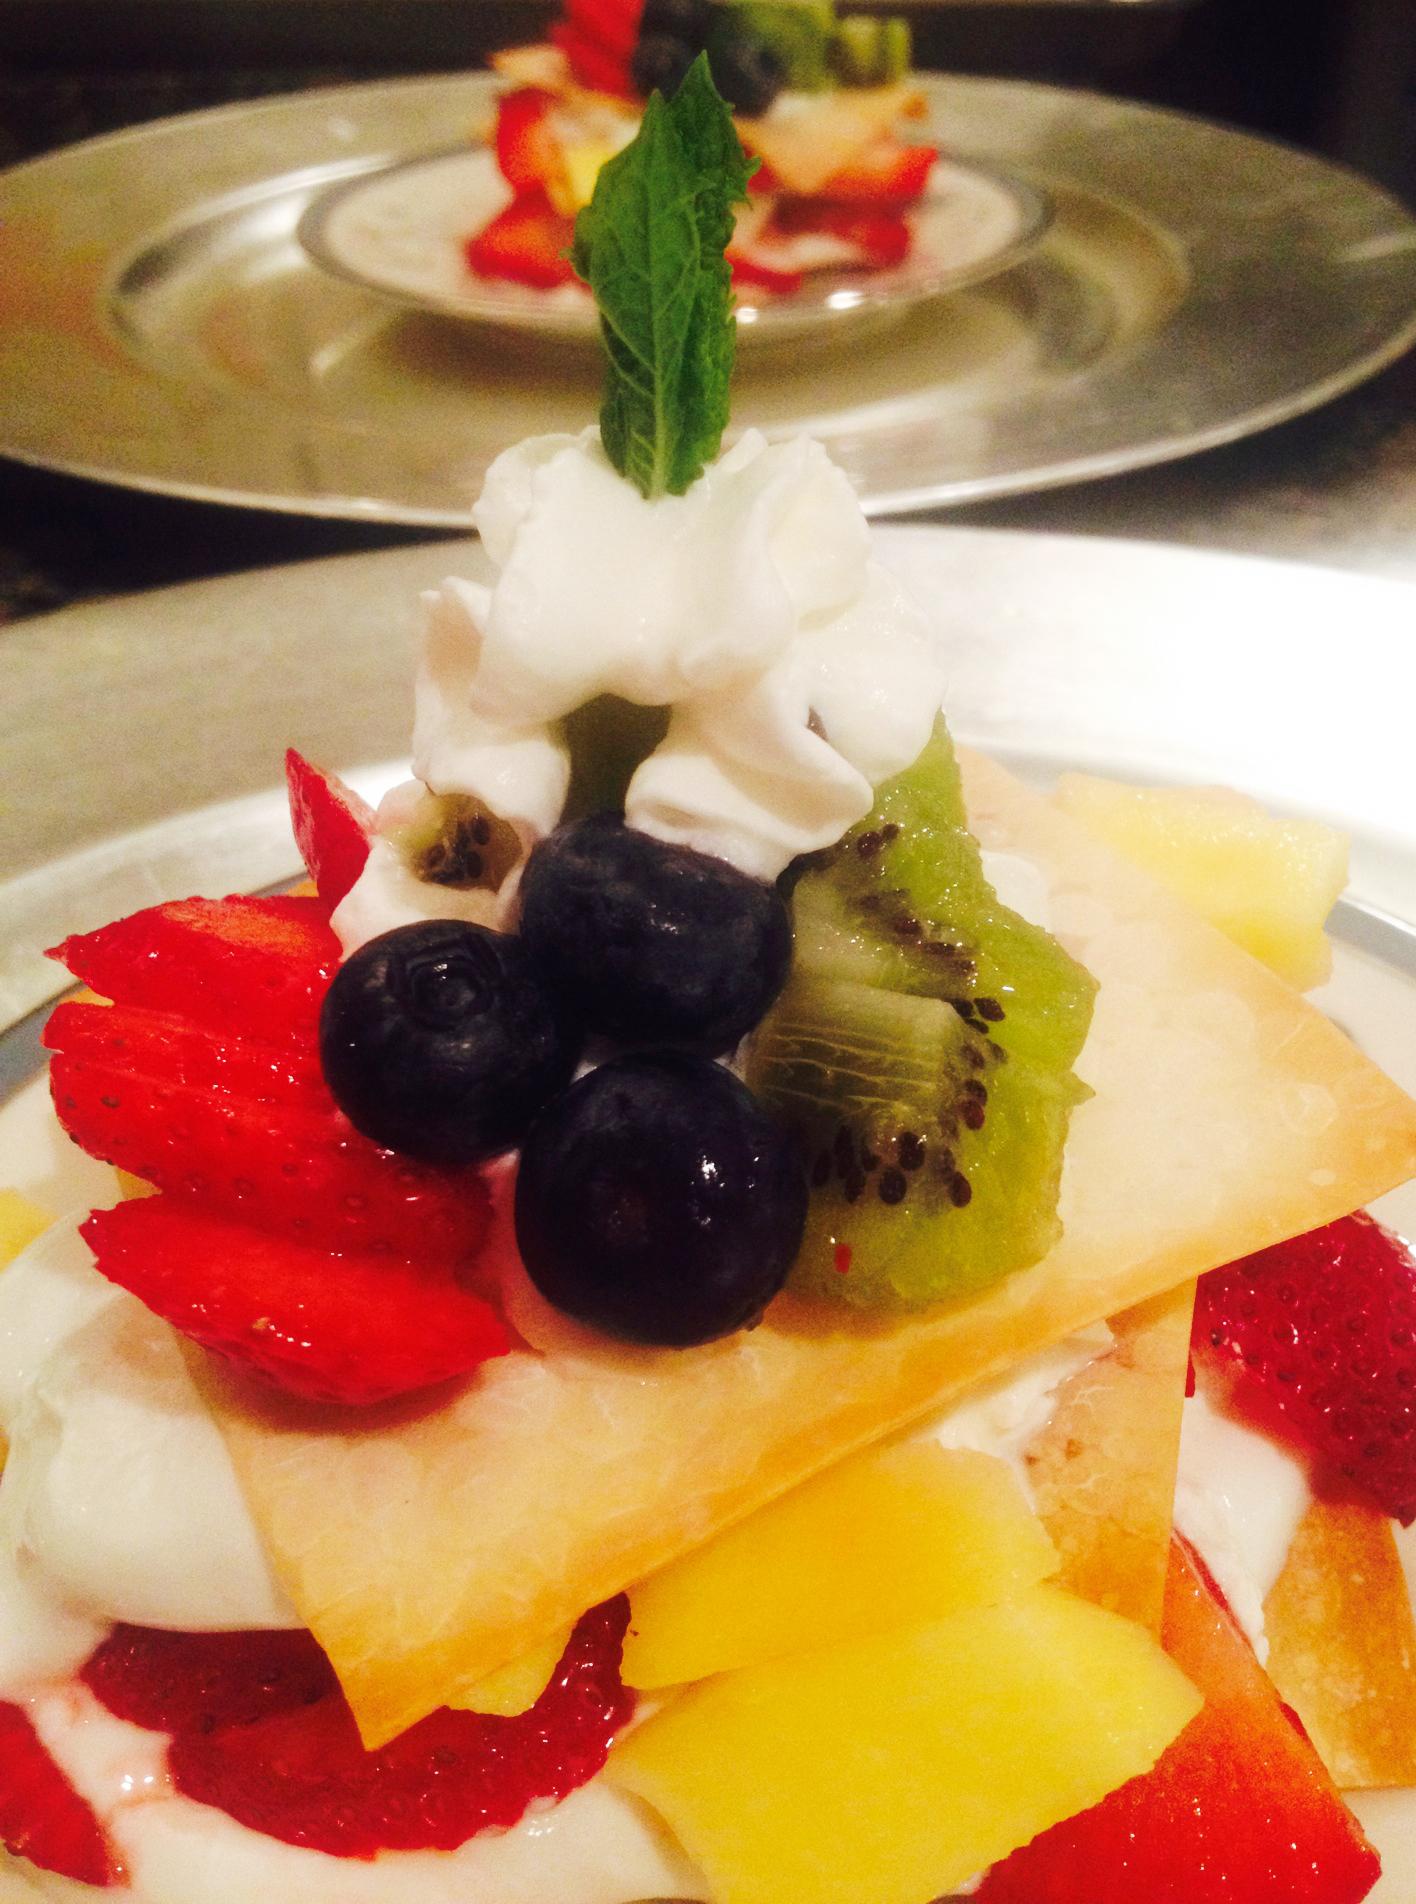 Layered Fresh Fruit Dessert